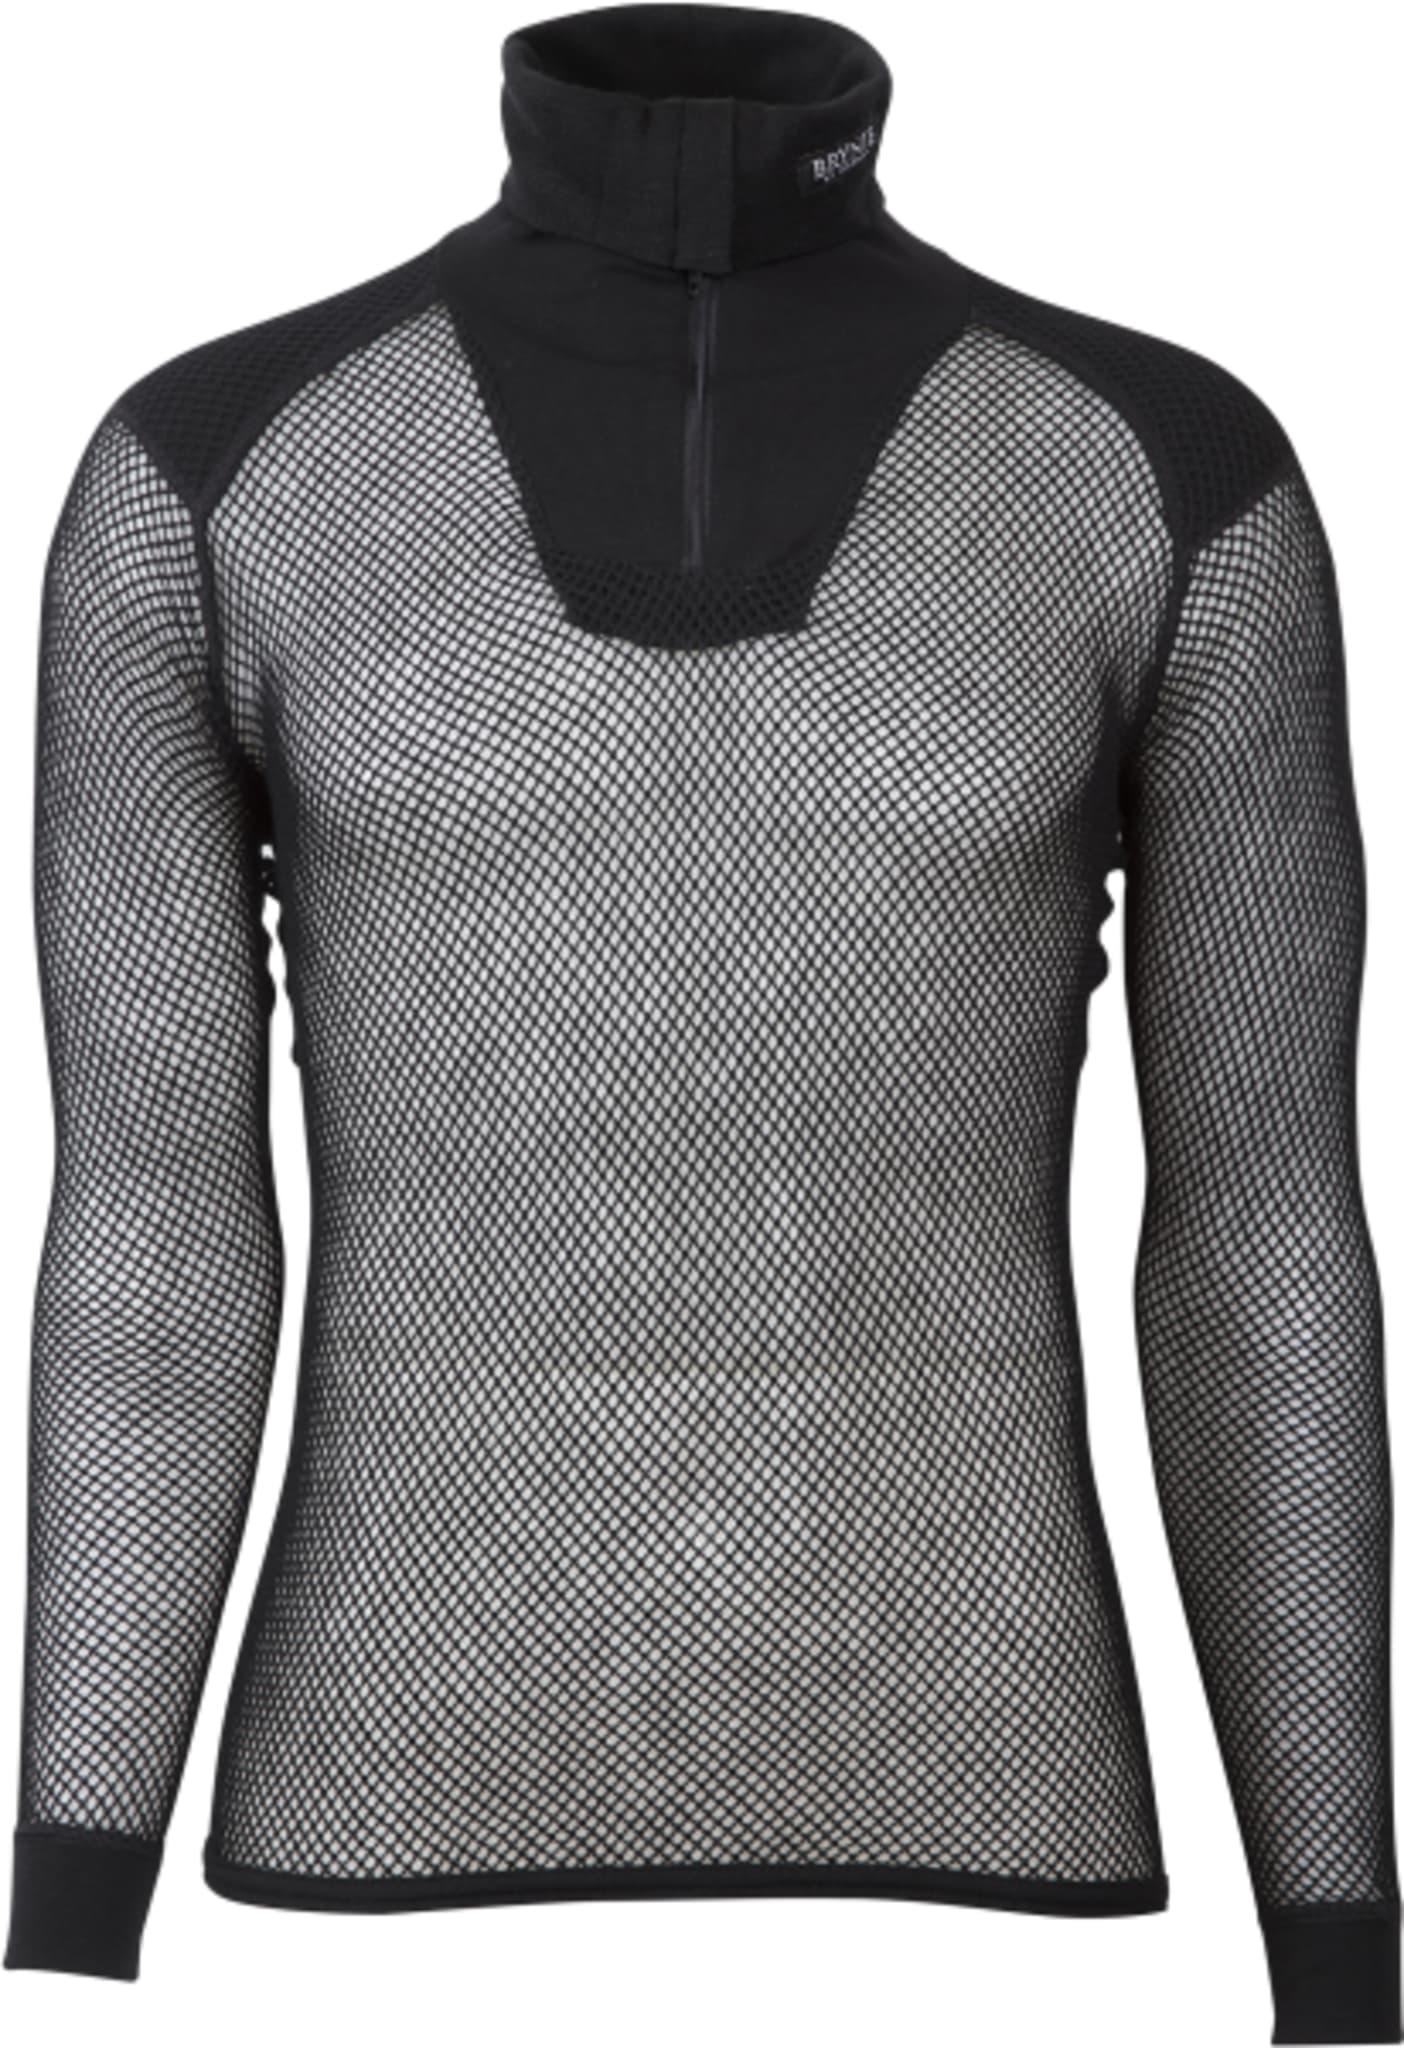 Høyhalset Wool Thermo trøye